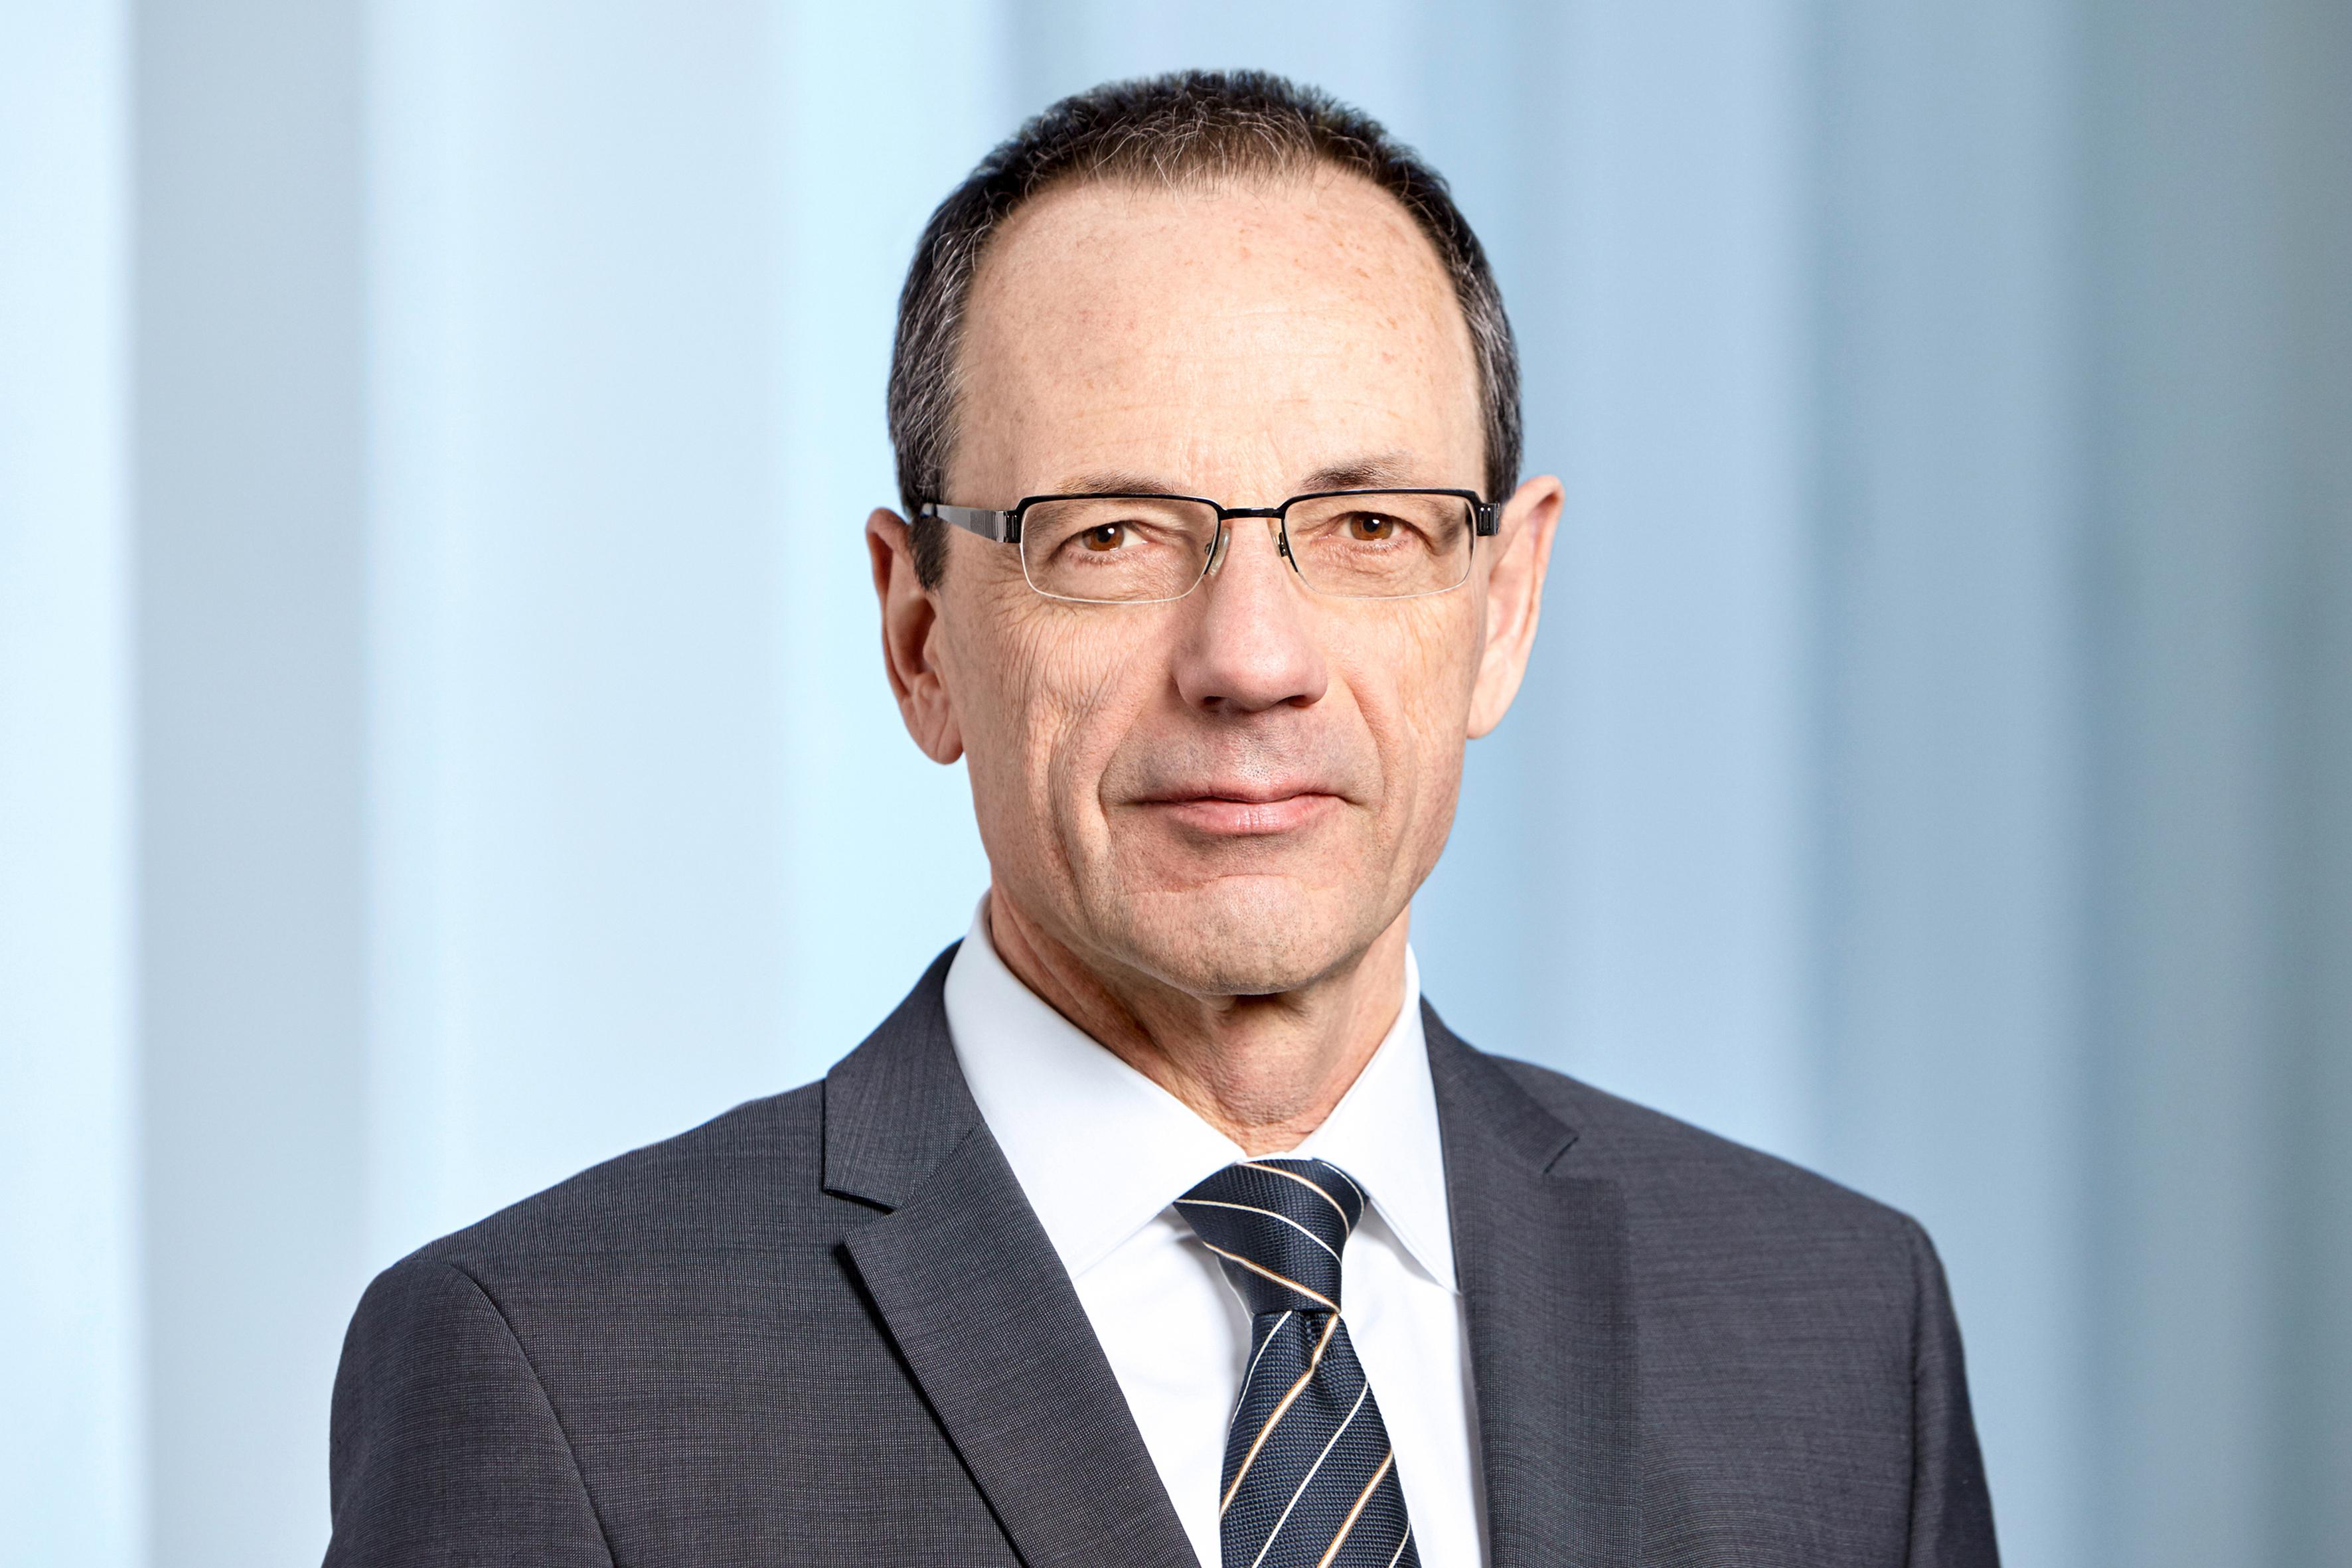 ino Guzzella, Président d'ETH Zürich